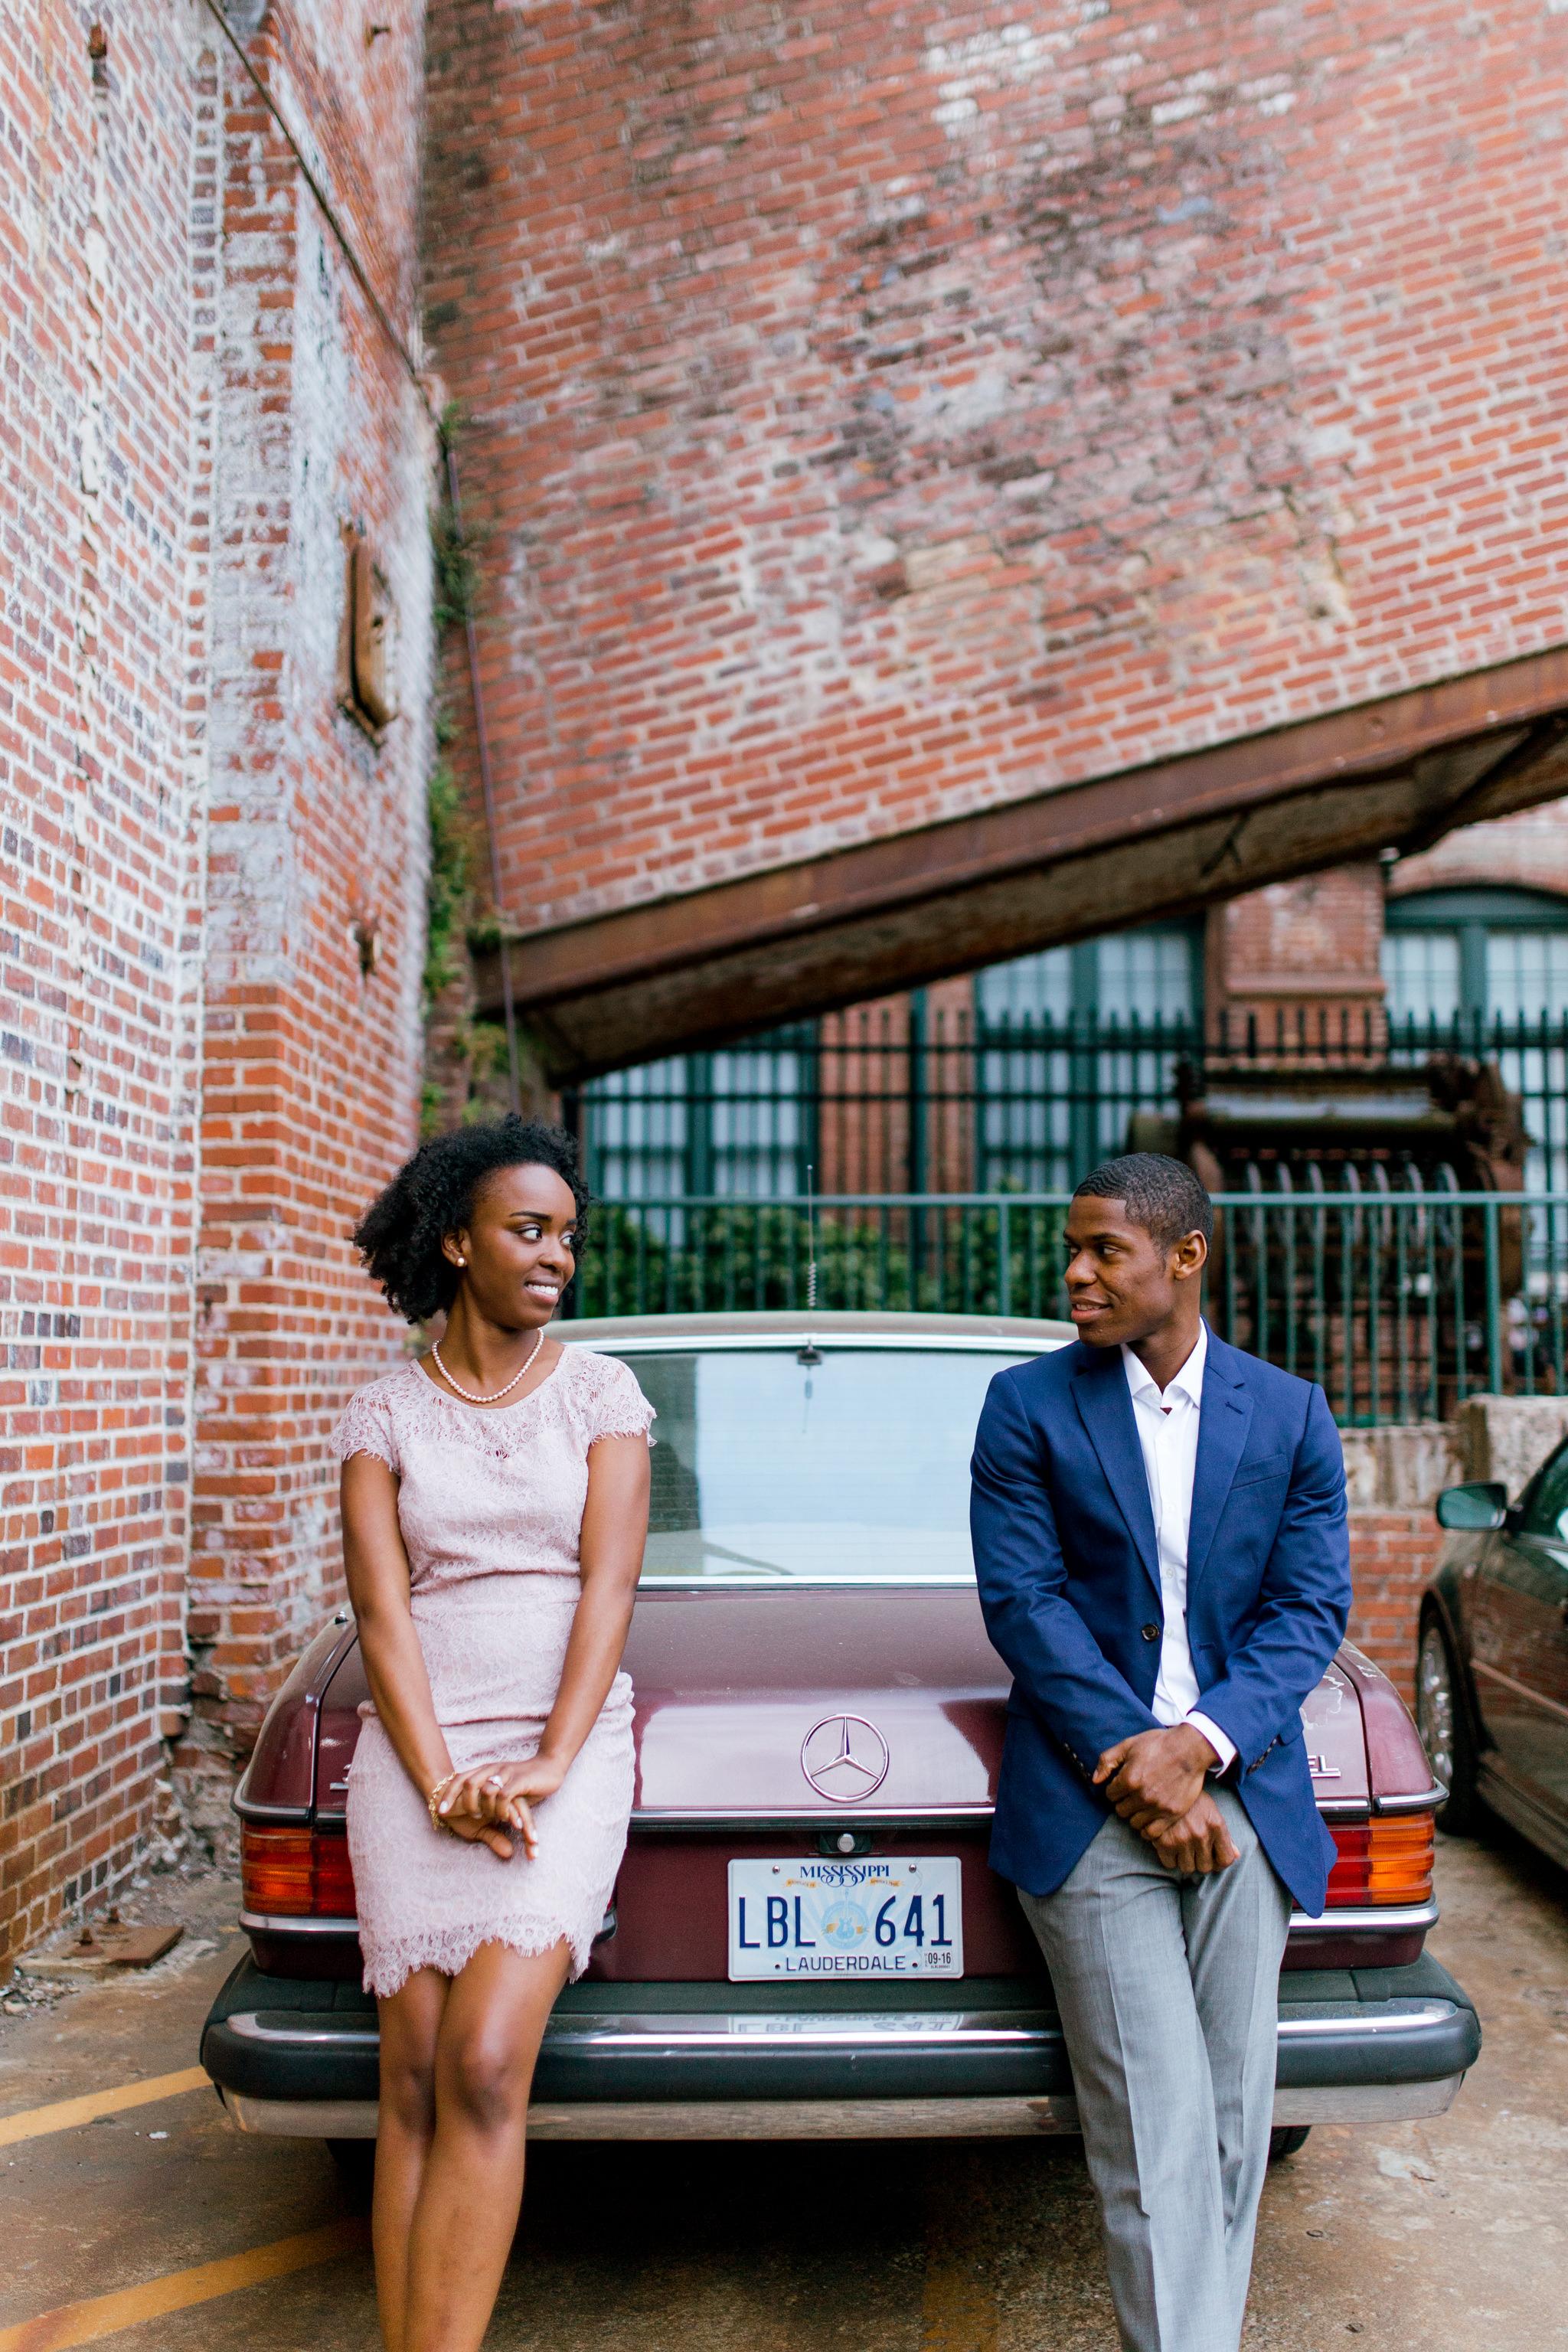 Grant-Park-Atlanta-Engagement-Pictures-Kiyah-C-Photography-29.jpg